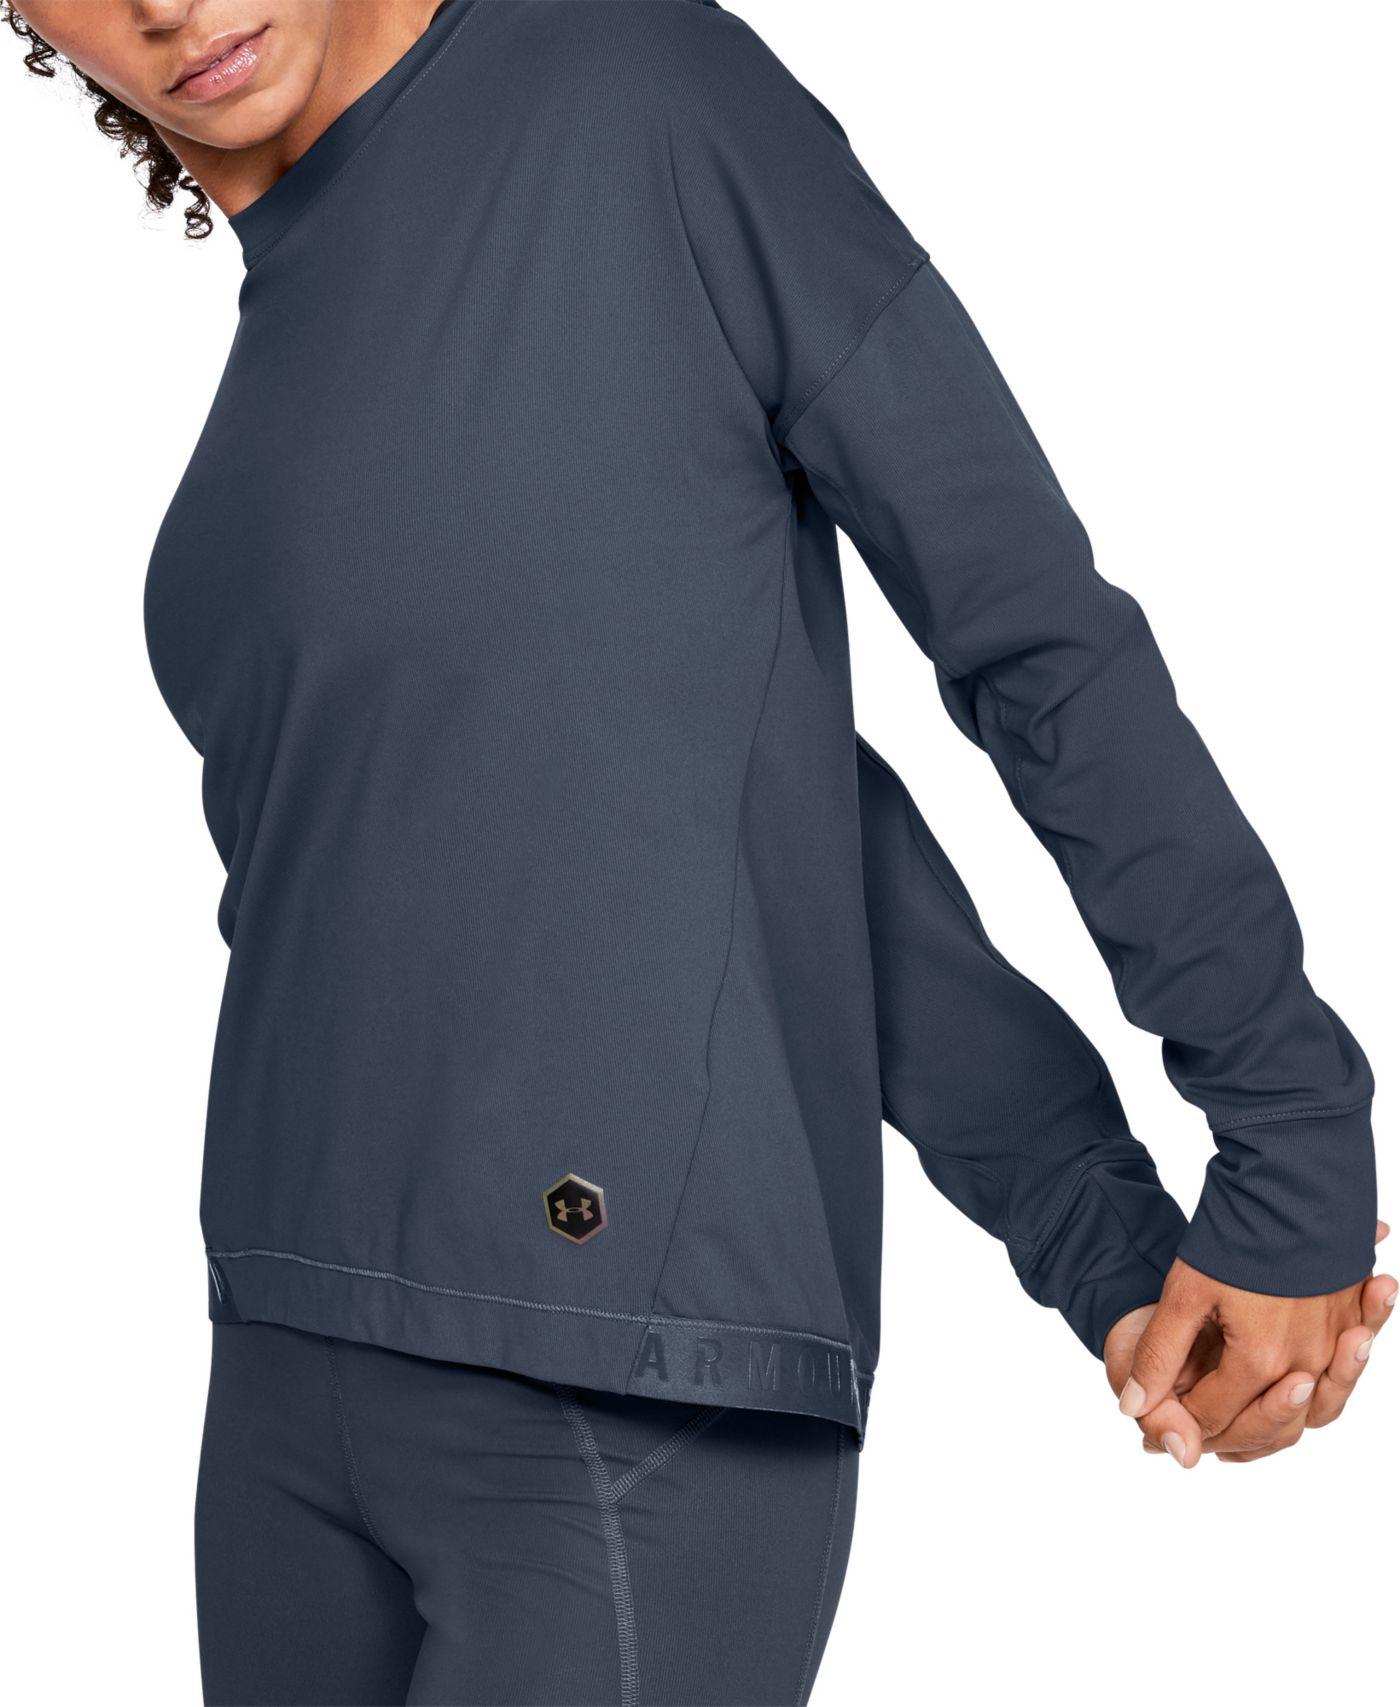 Under Armour Women's RUSH ColdGear Pullover